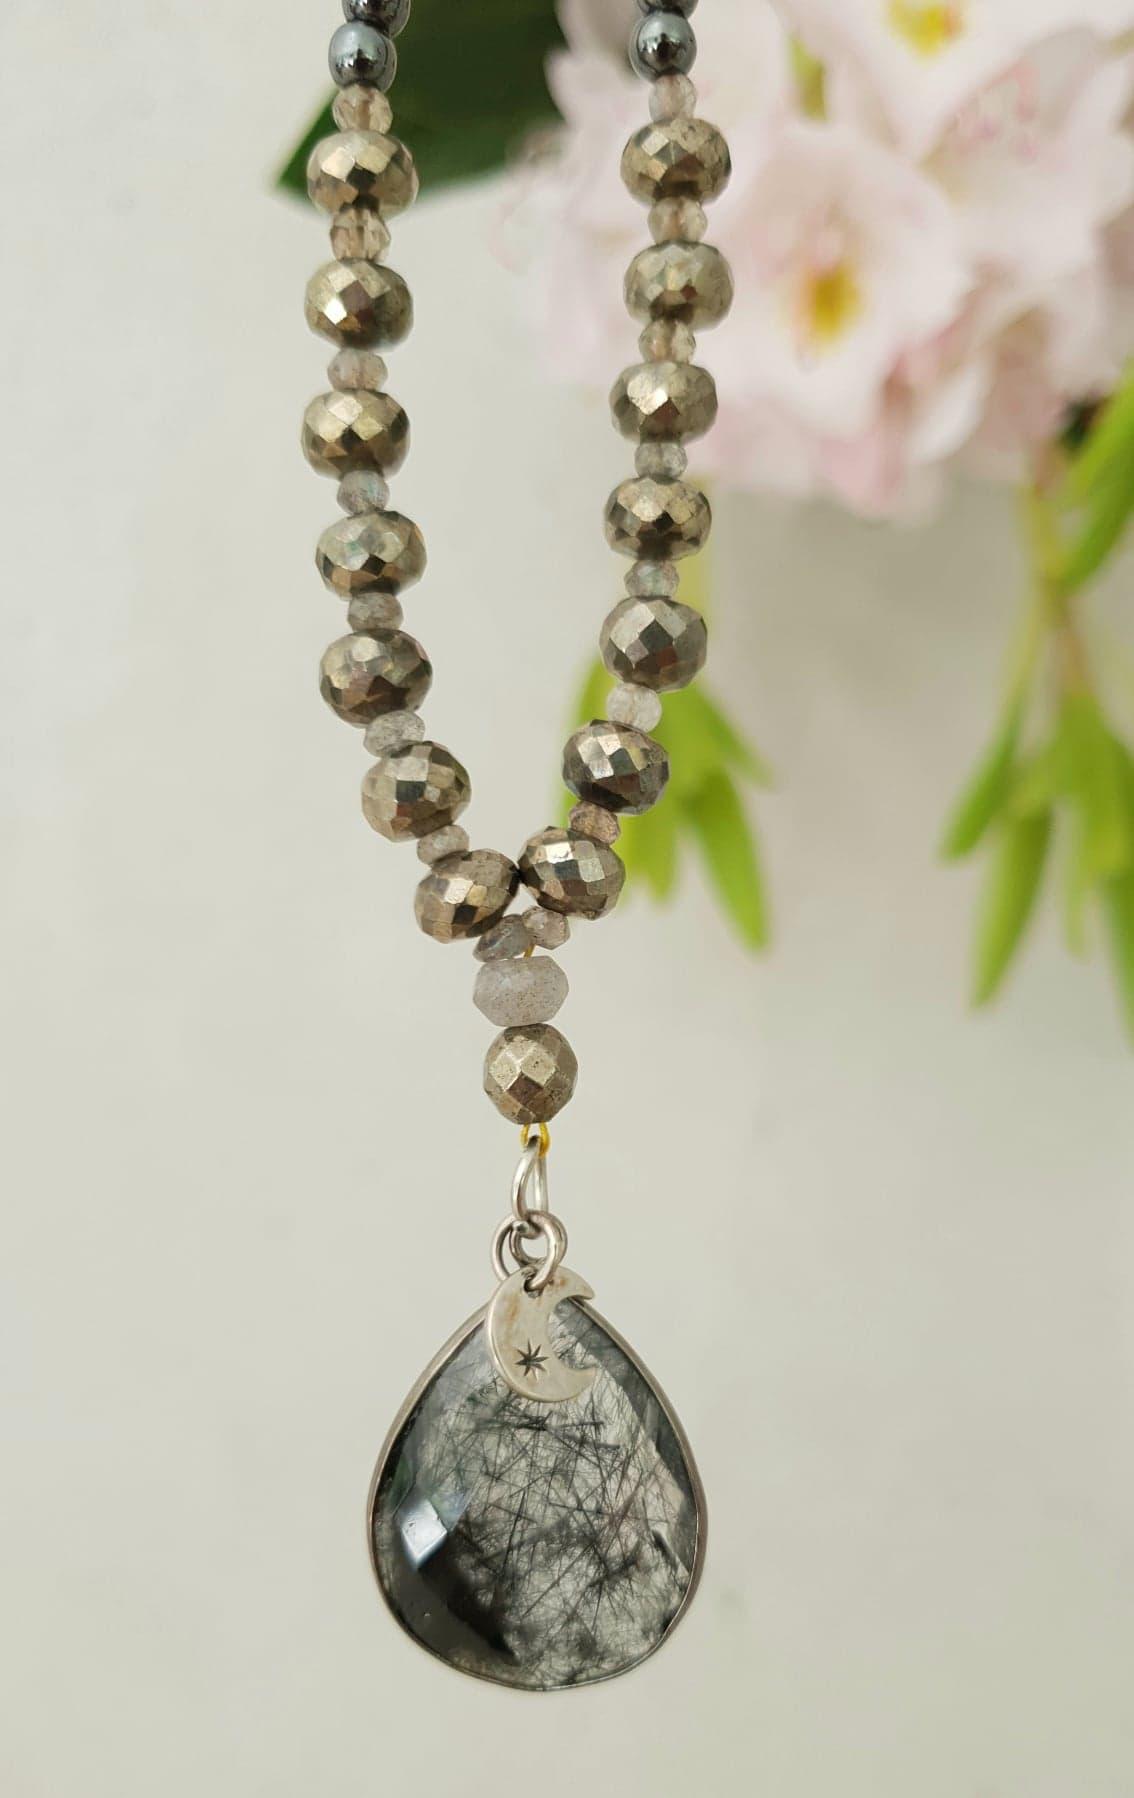 Hematit kæde med pyrit og drop i rutile quartz